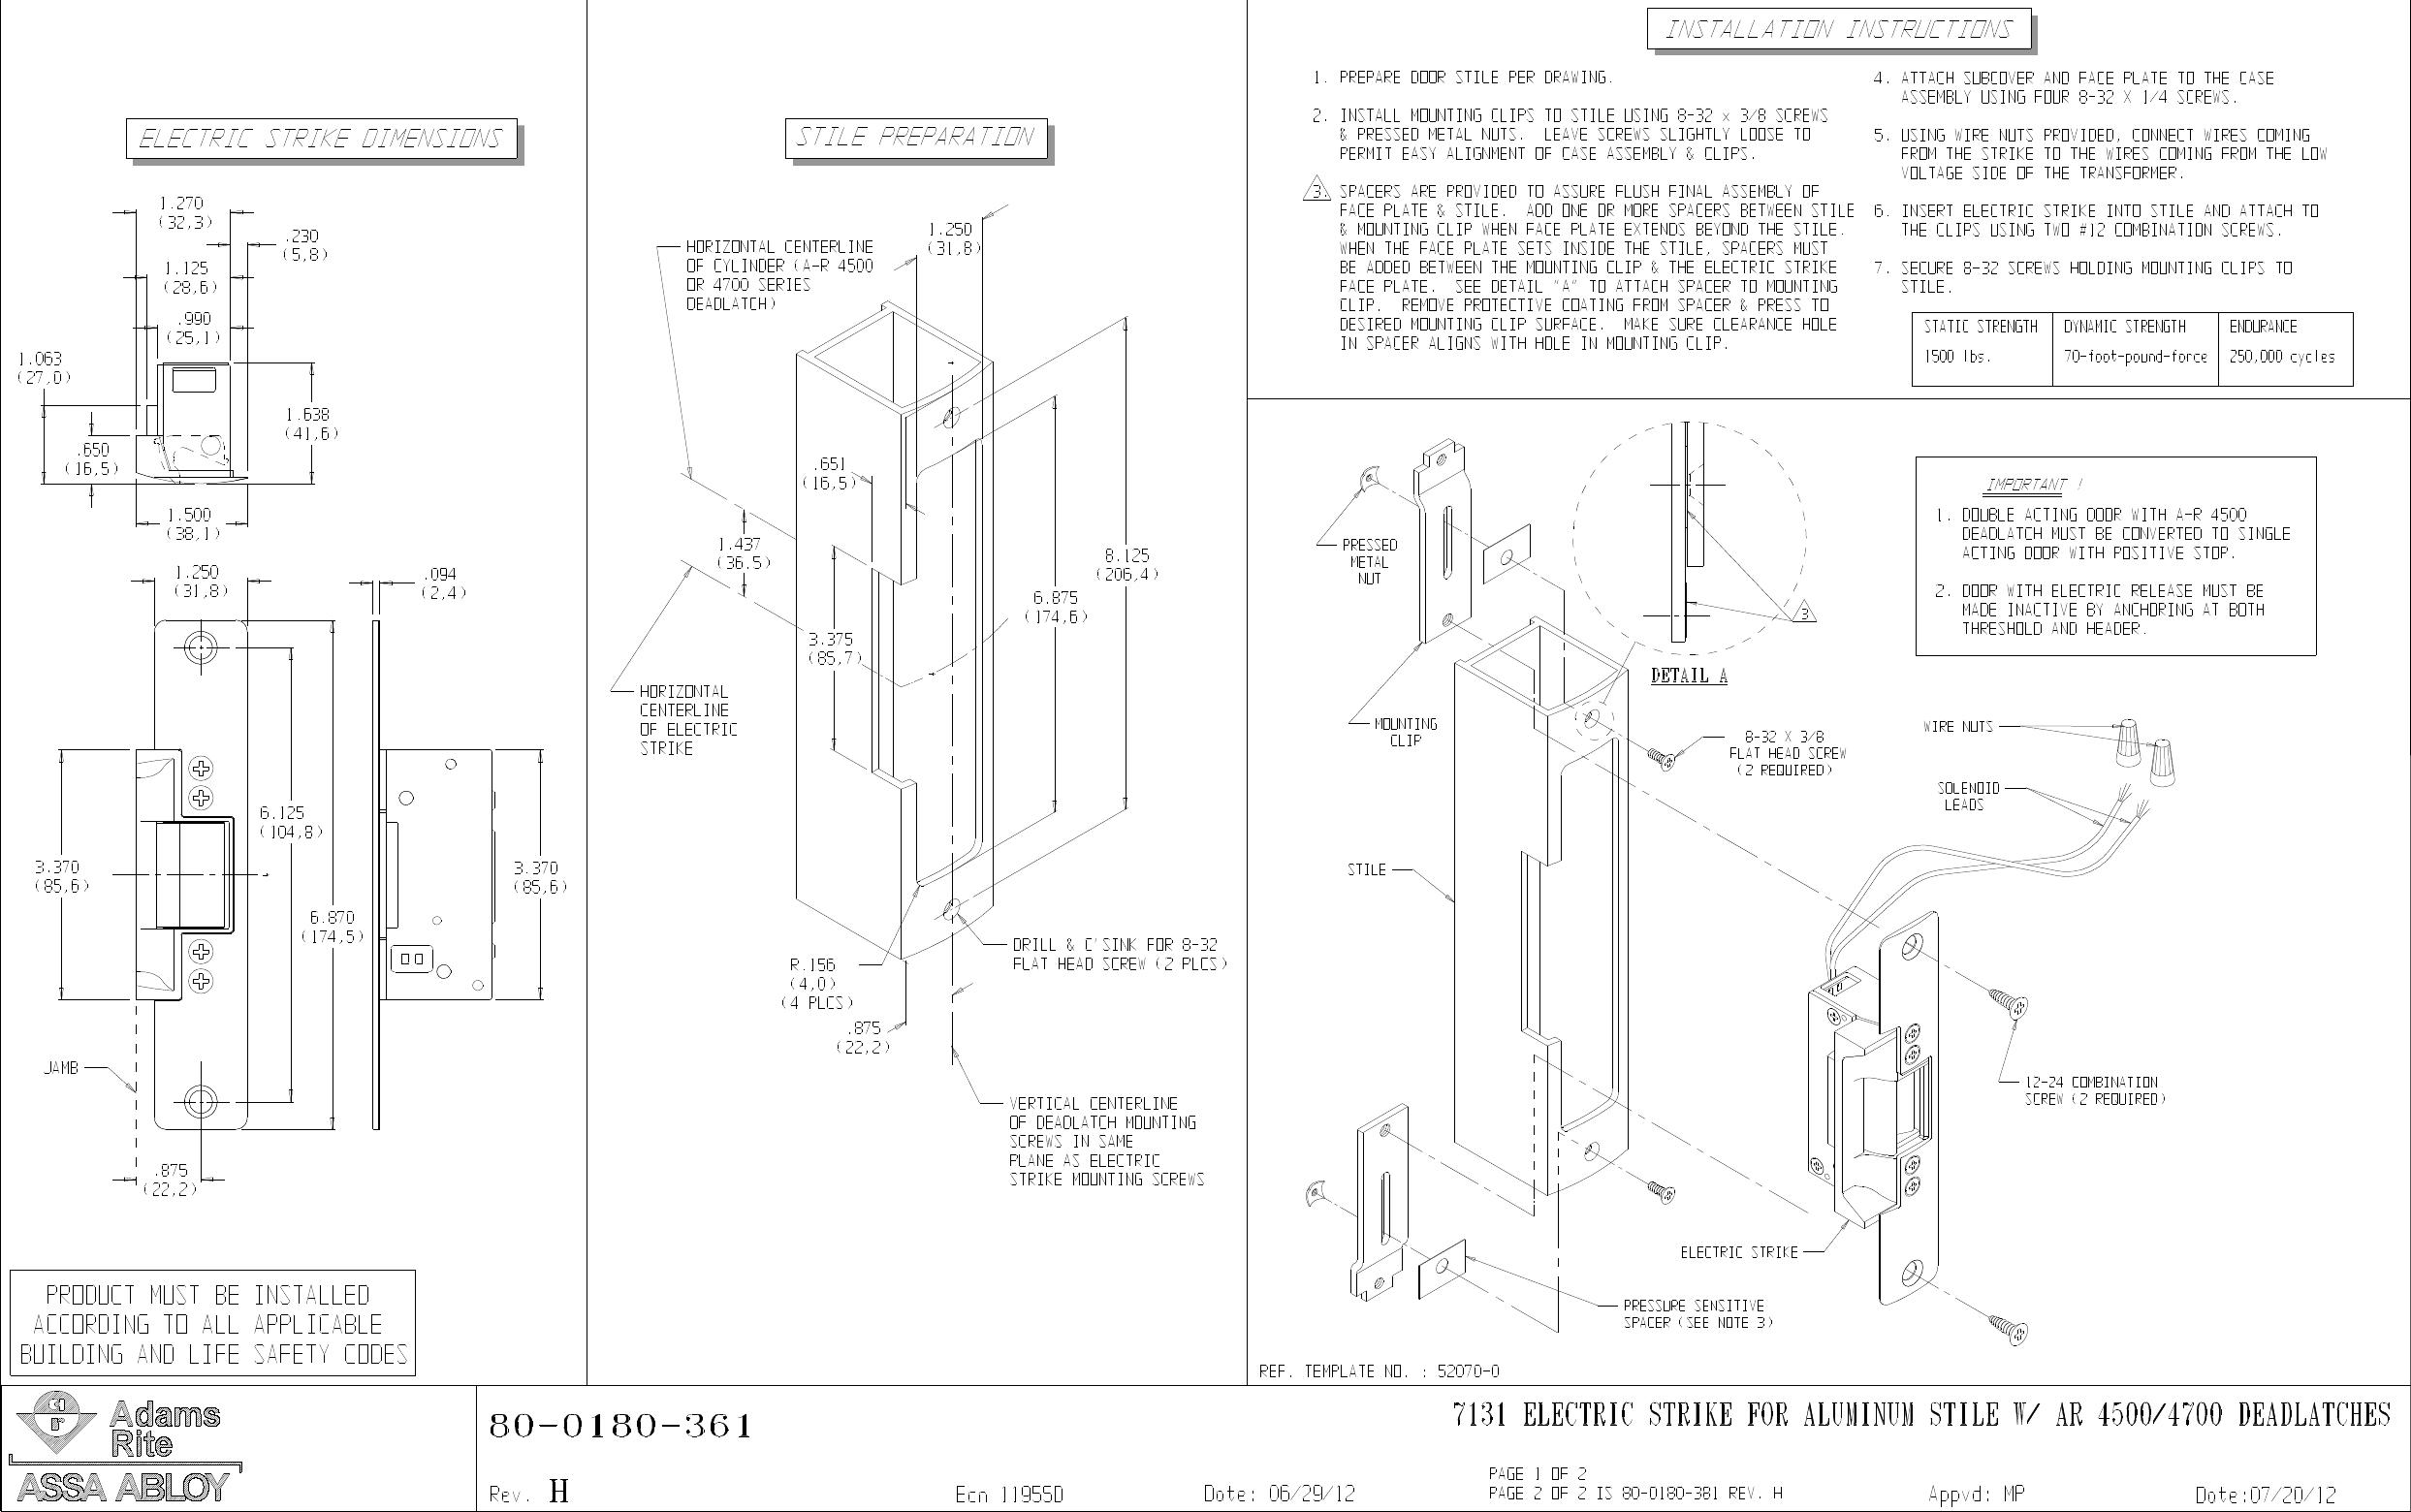 Adams Rite Electric Strike Wiring Diagram Download